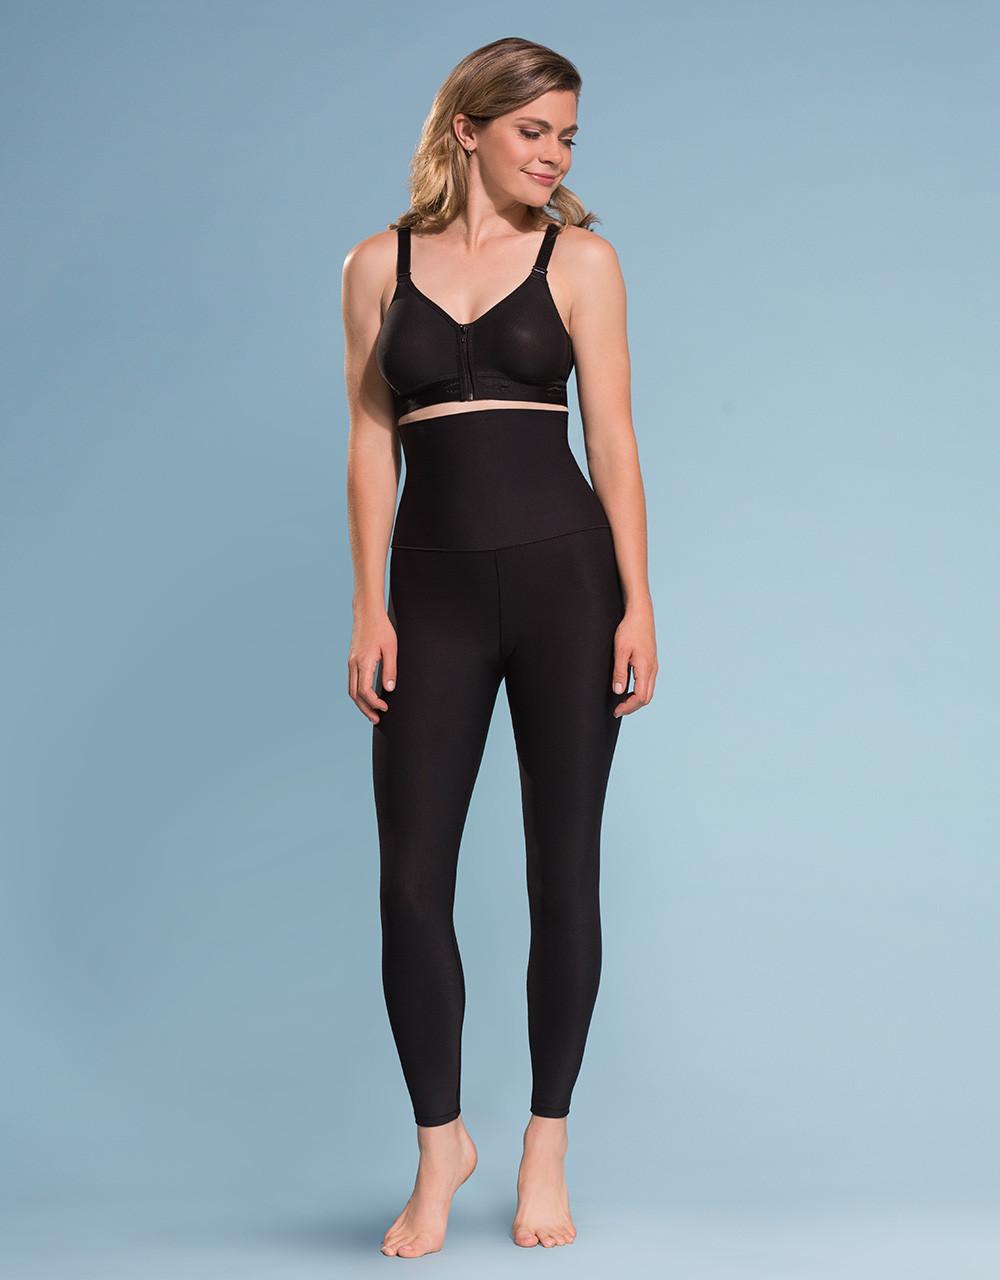 b250cd4f88ecb Marena Shape ME-211 high-waist compression leggings with wide band